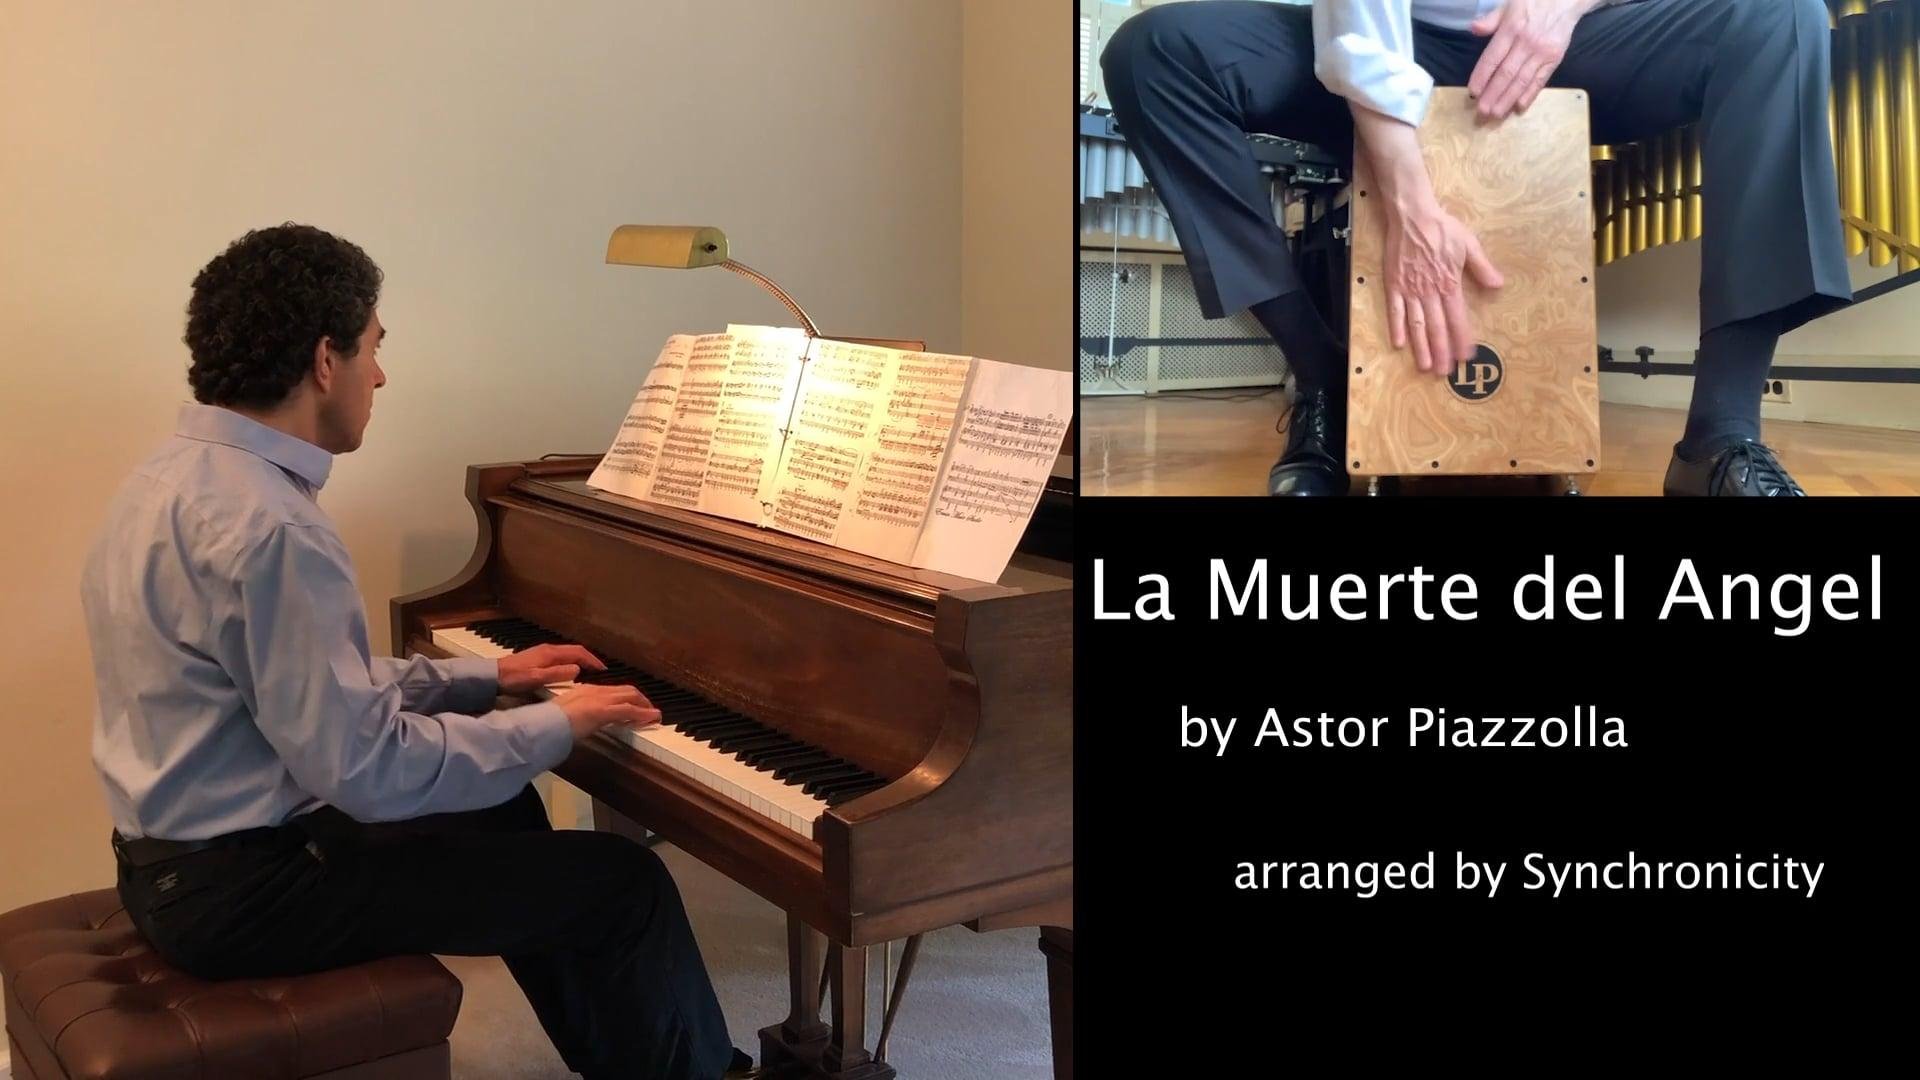 La Muerte del Angel by Astor Piazzolla arr. by Synchronicity